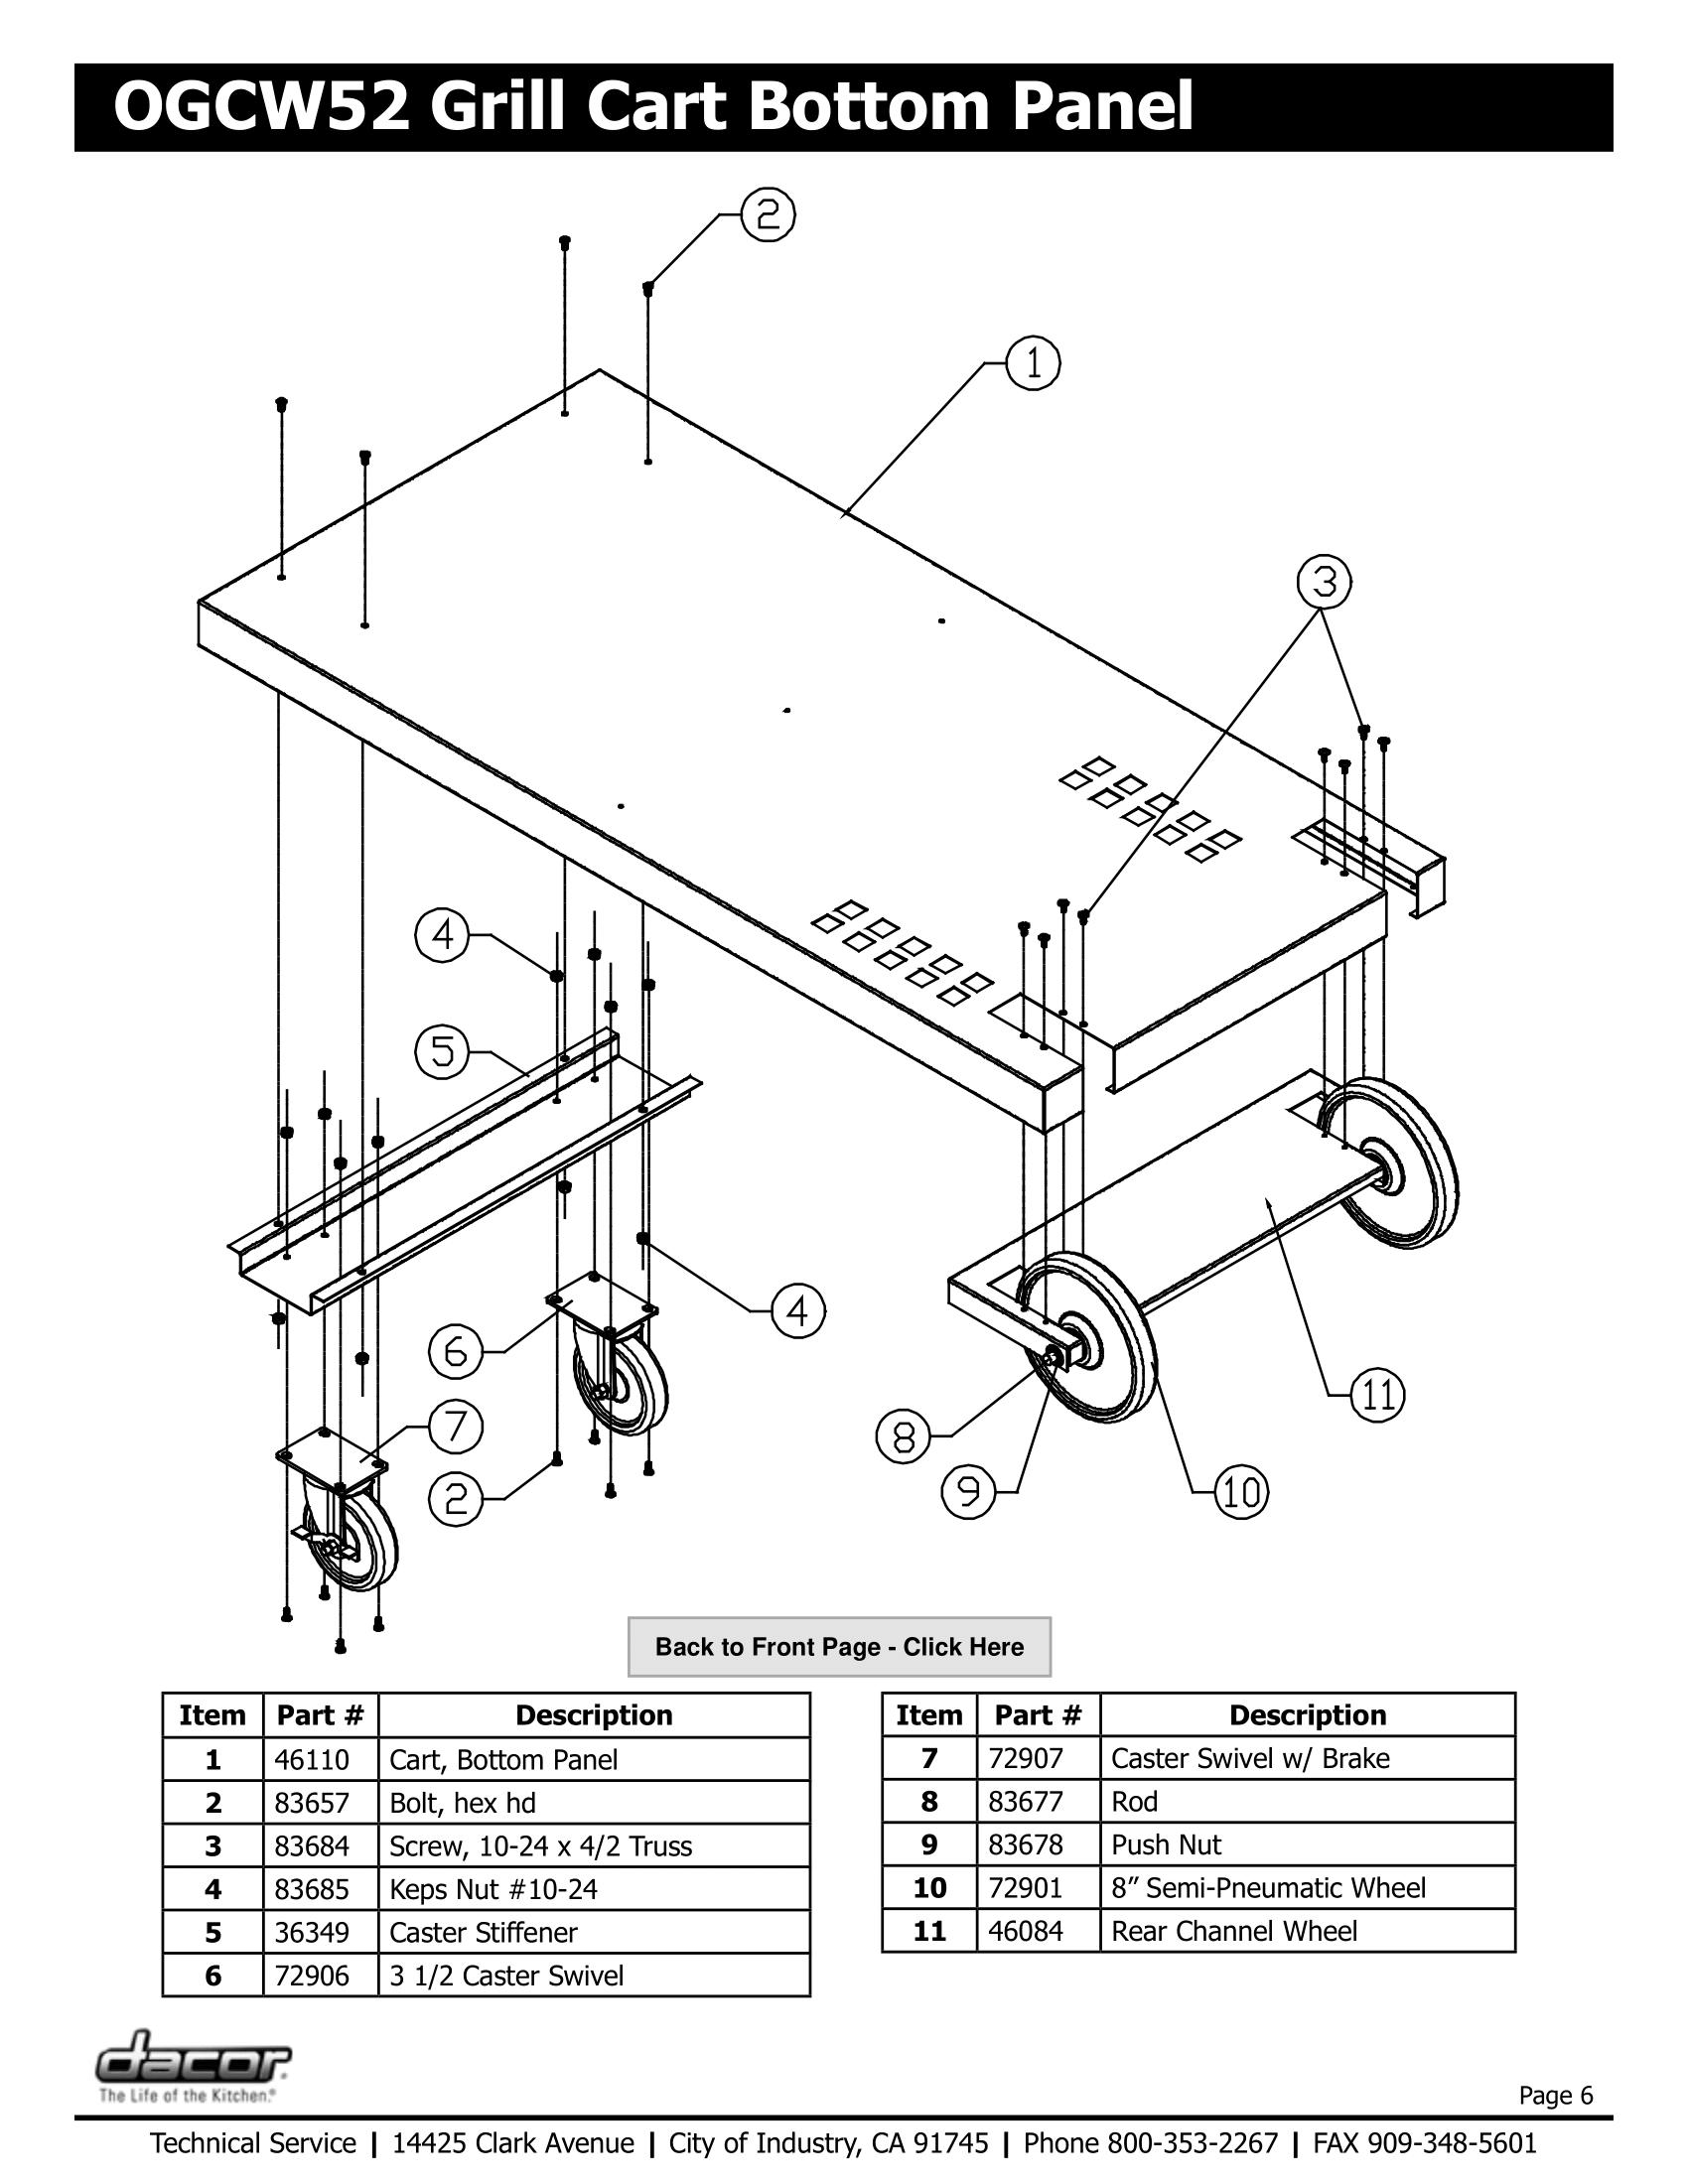 Dacor OGCW52 Bottom Panel Schematic